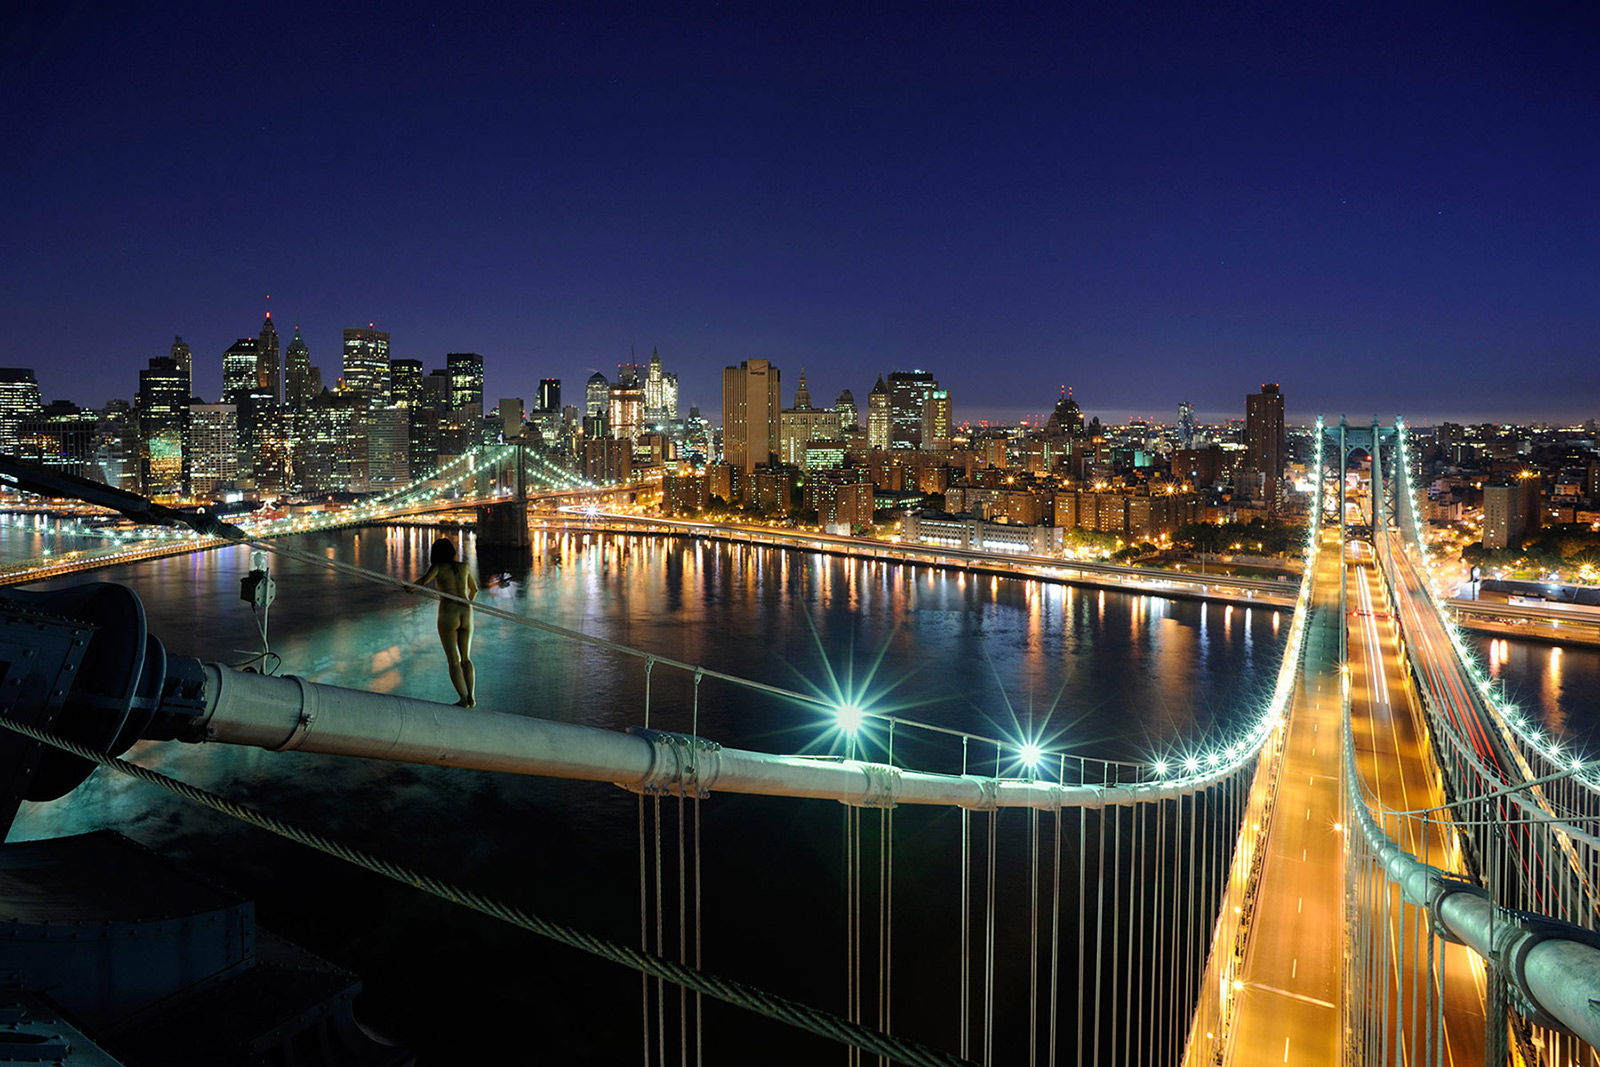 Manhattan Bridge, <br>New York, NY, USA